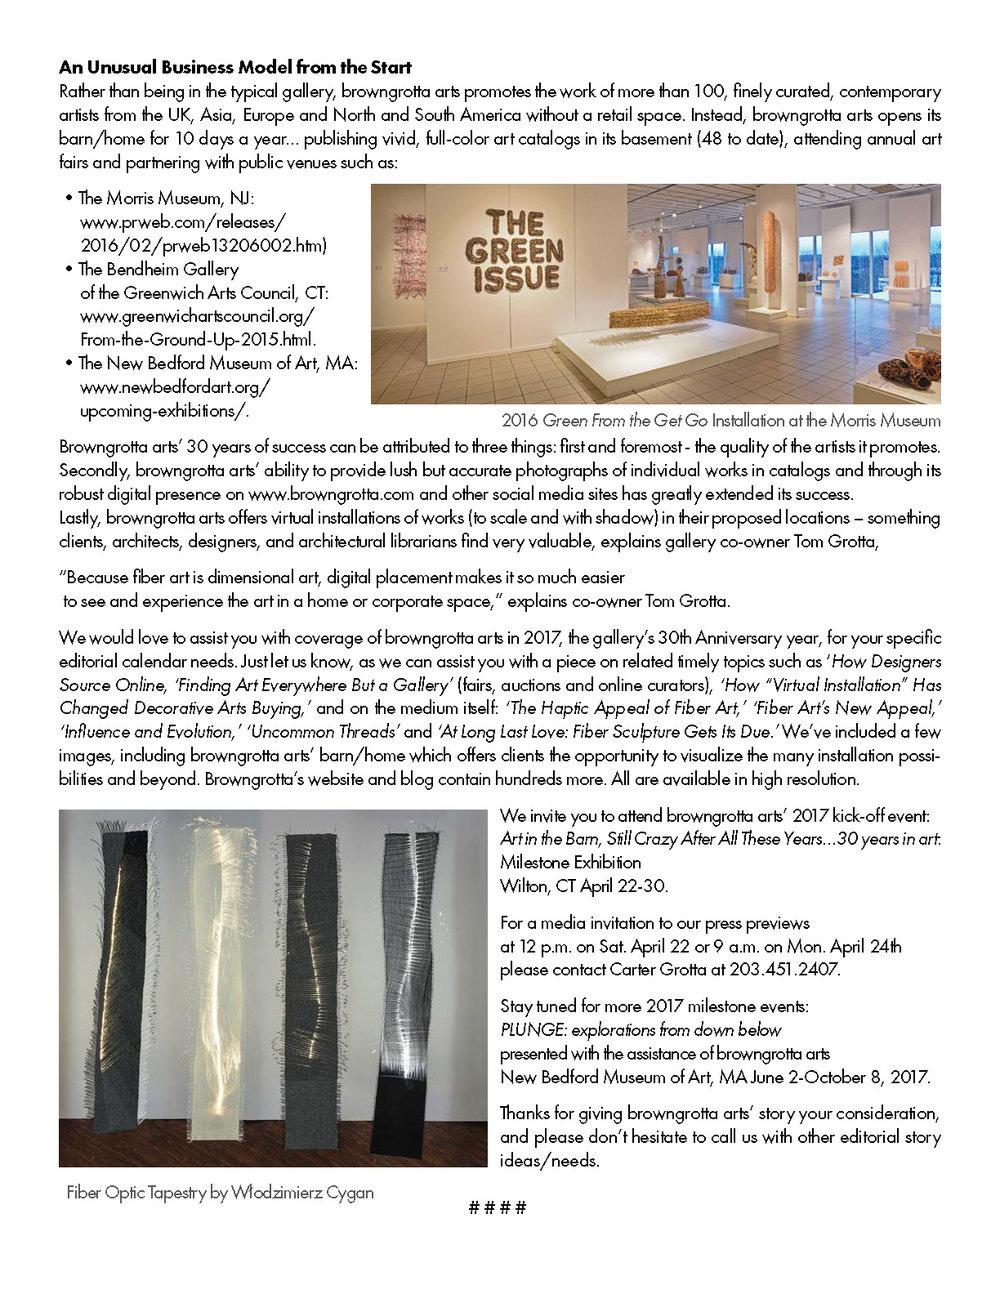 Browngrotta+Arts+Press+Release_Page_2.jpg